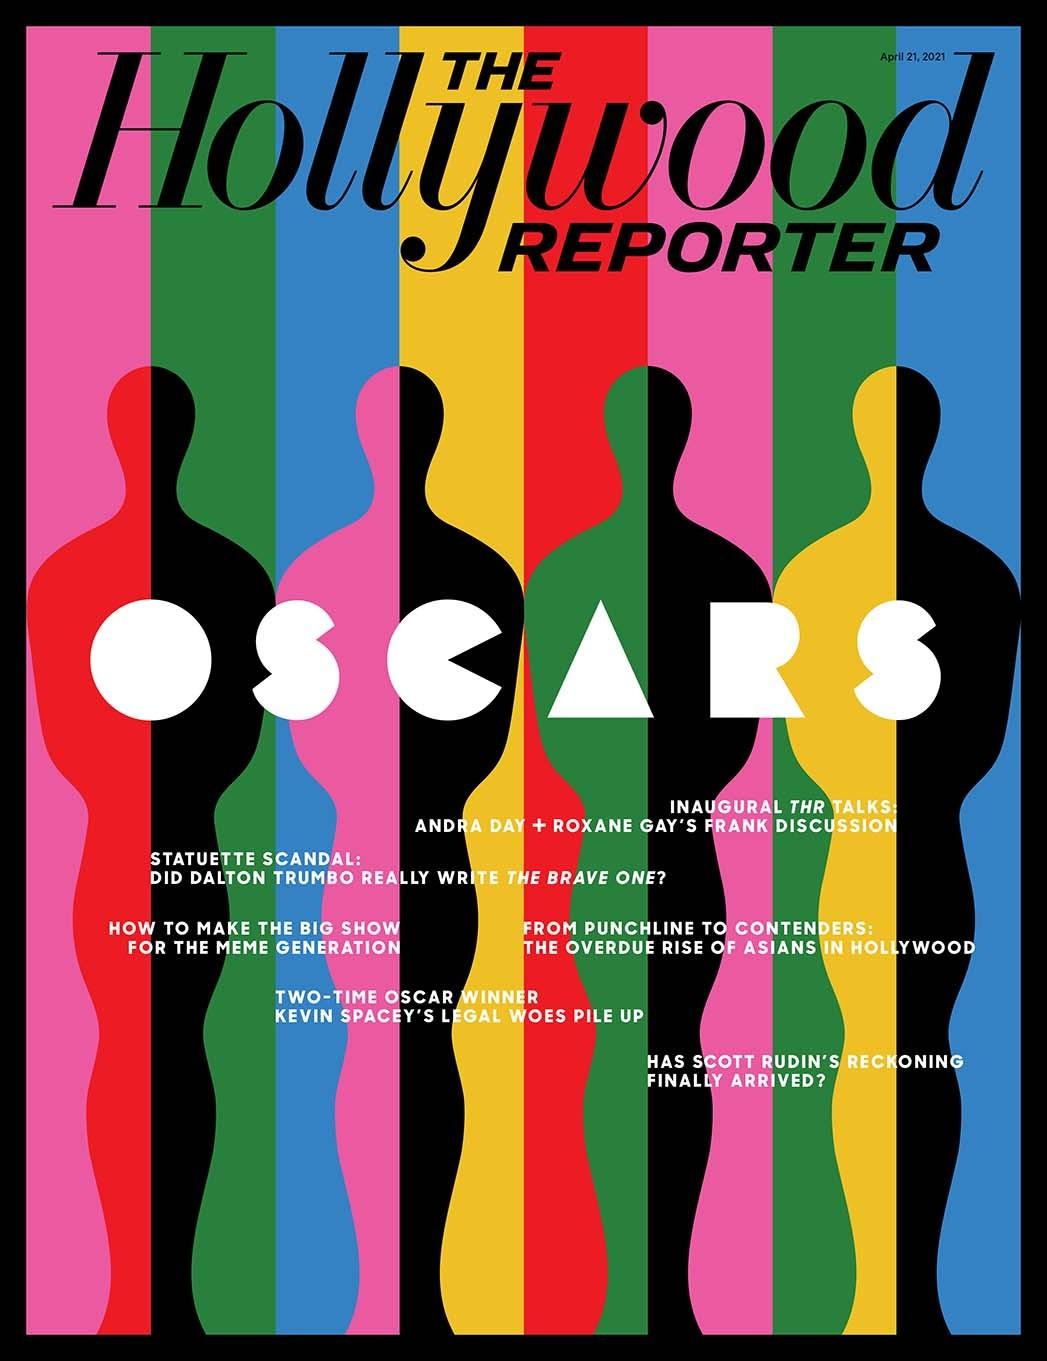 THR's Oscars Issue